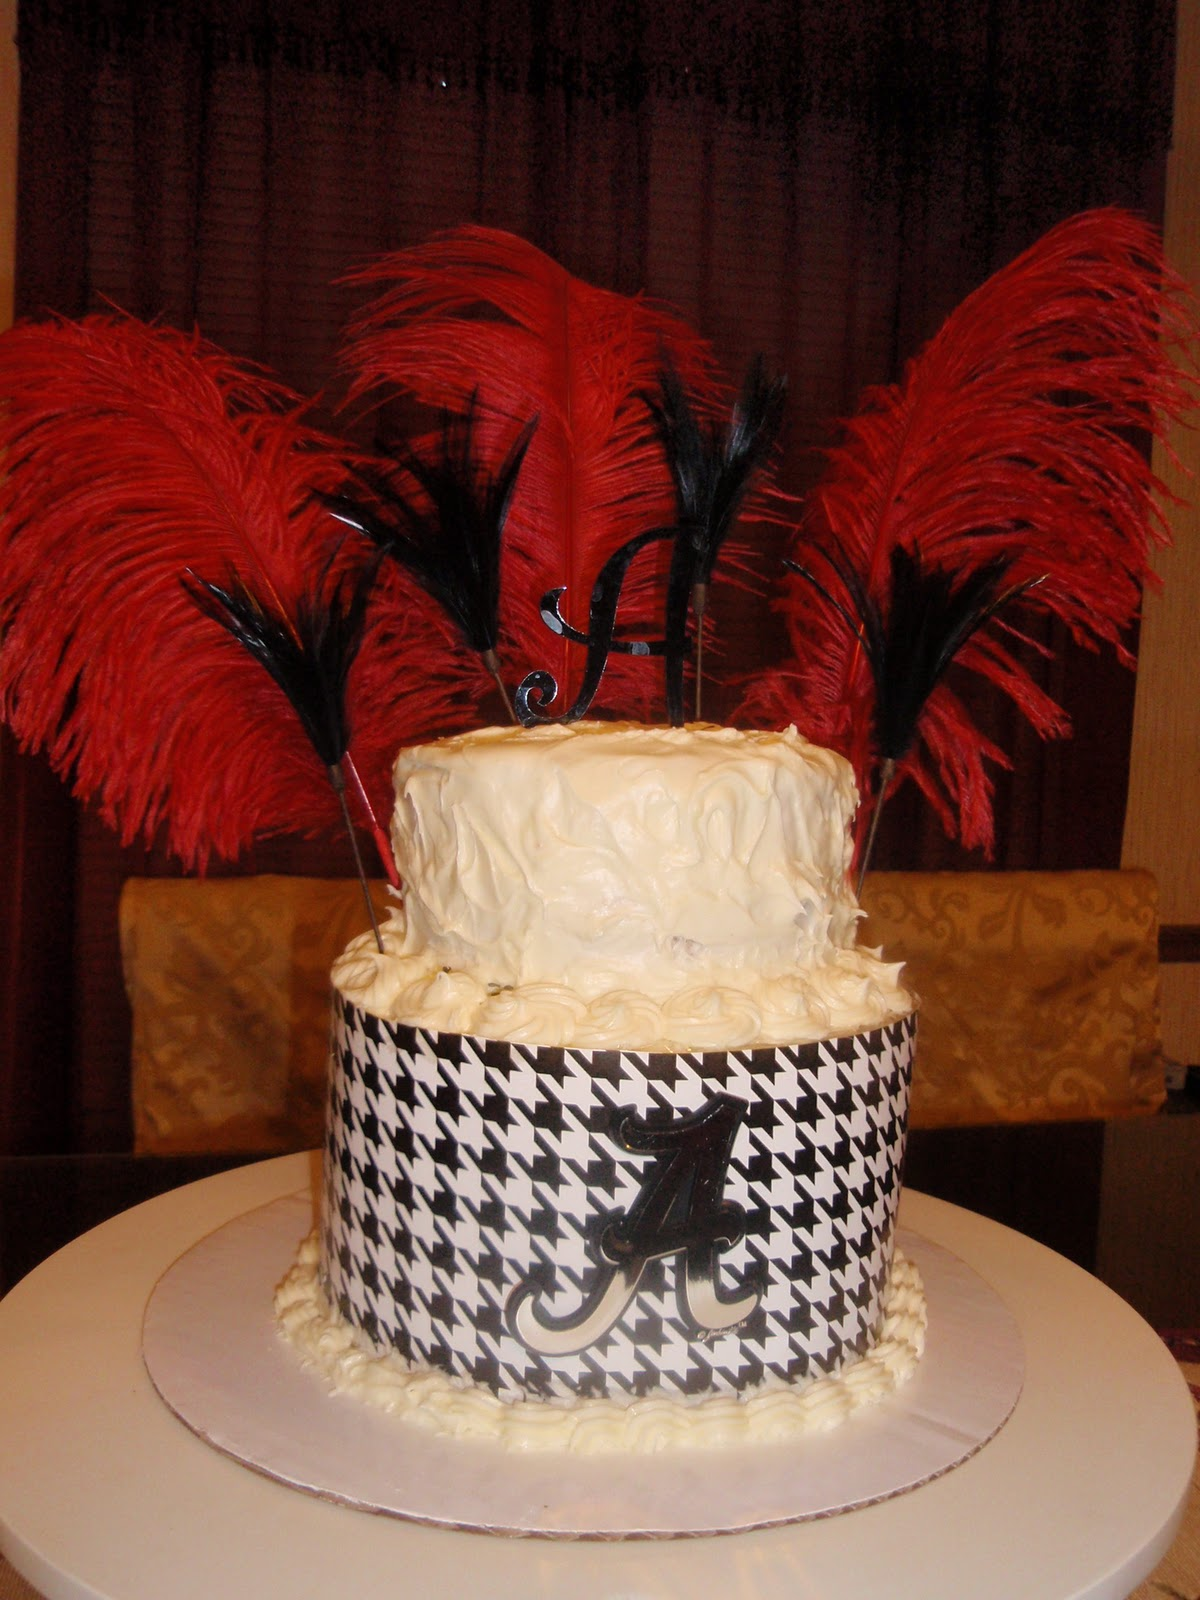 January Birthday Cakes Totsie s Cakes & More